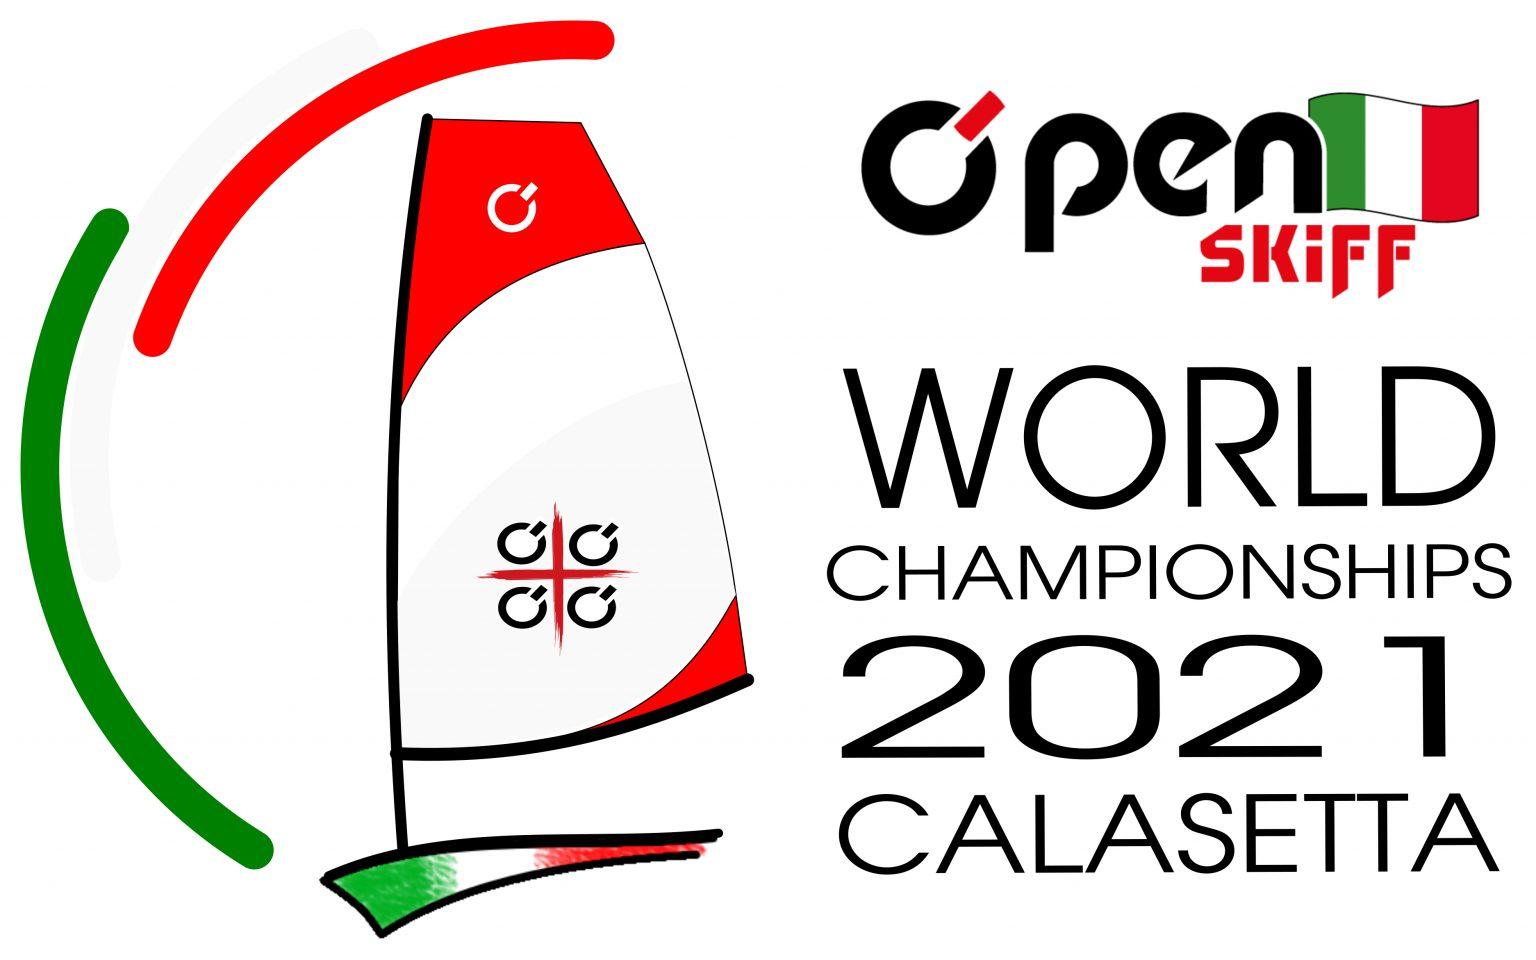 O'pen Skiff World Championships 2021